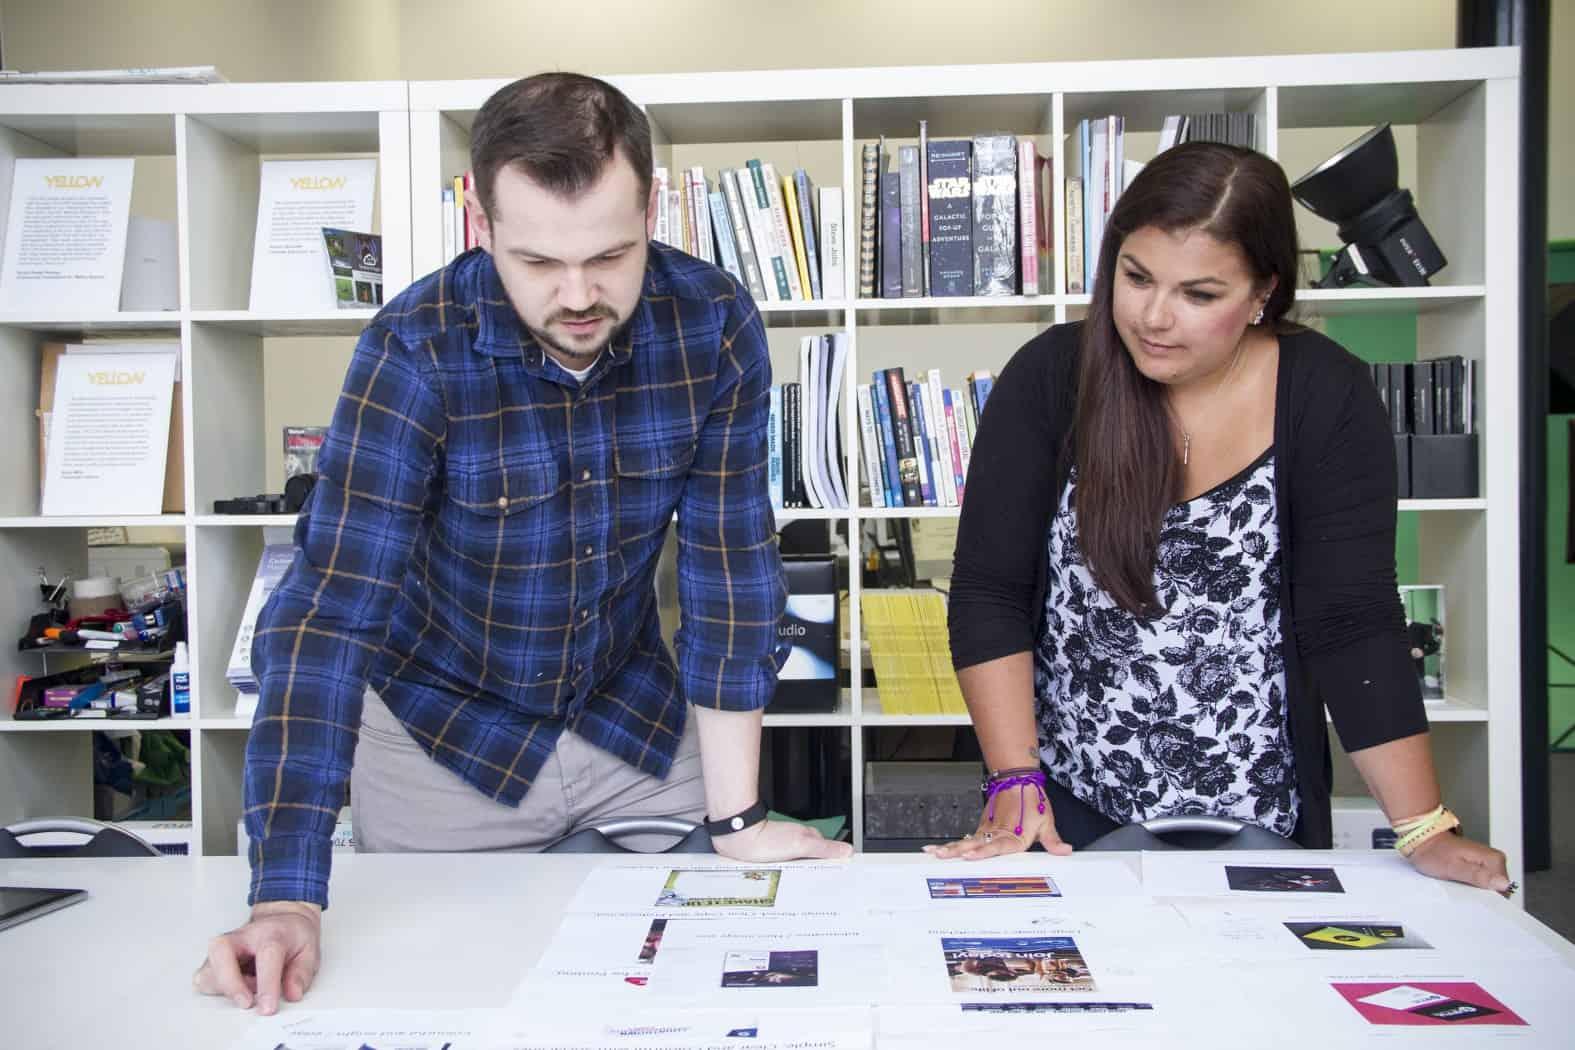 marketing agency liverpool - brainstorming